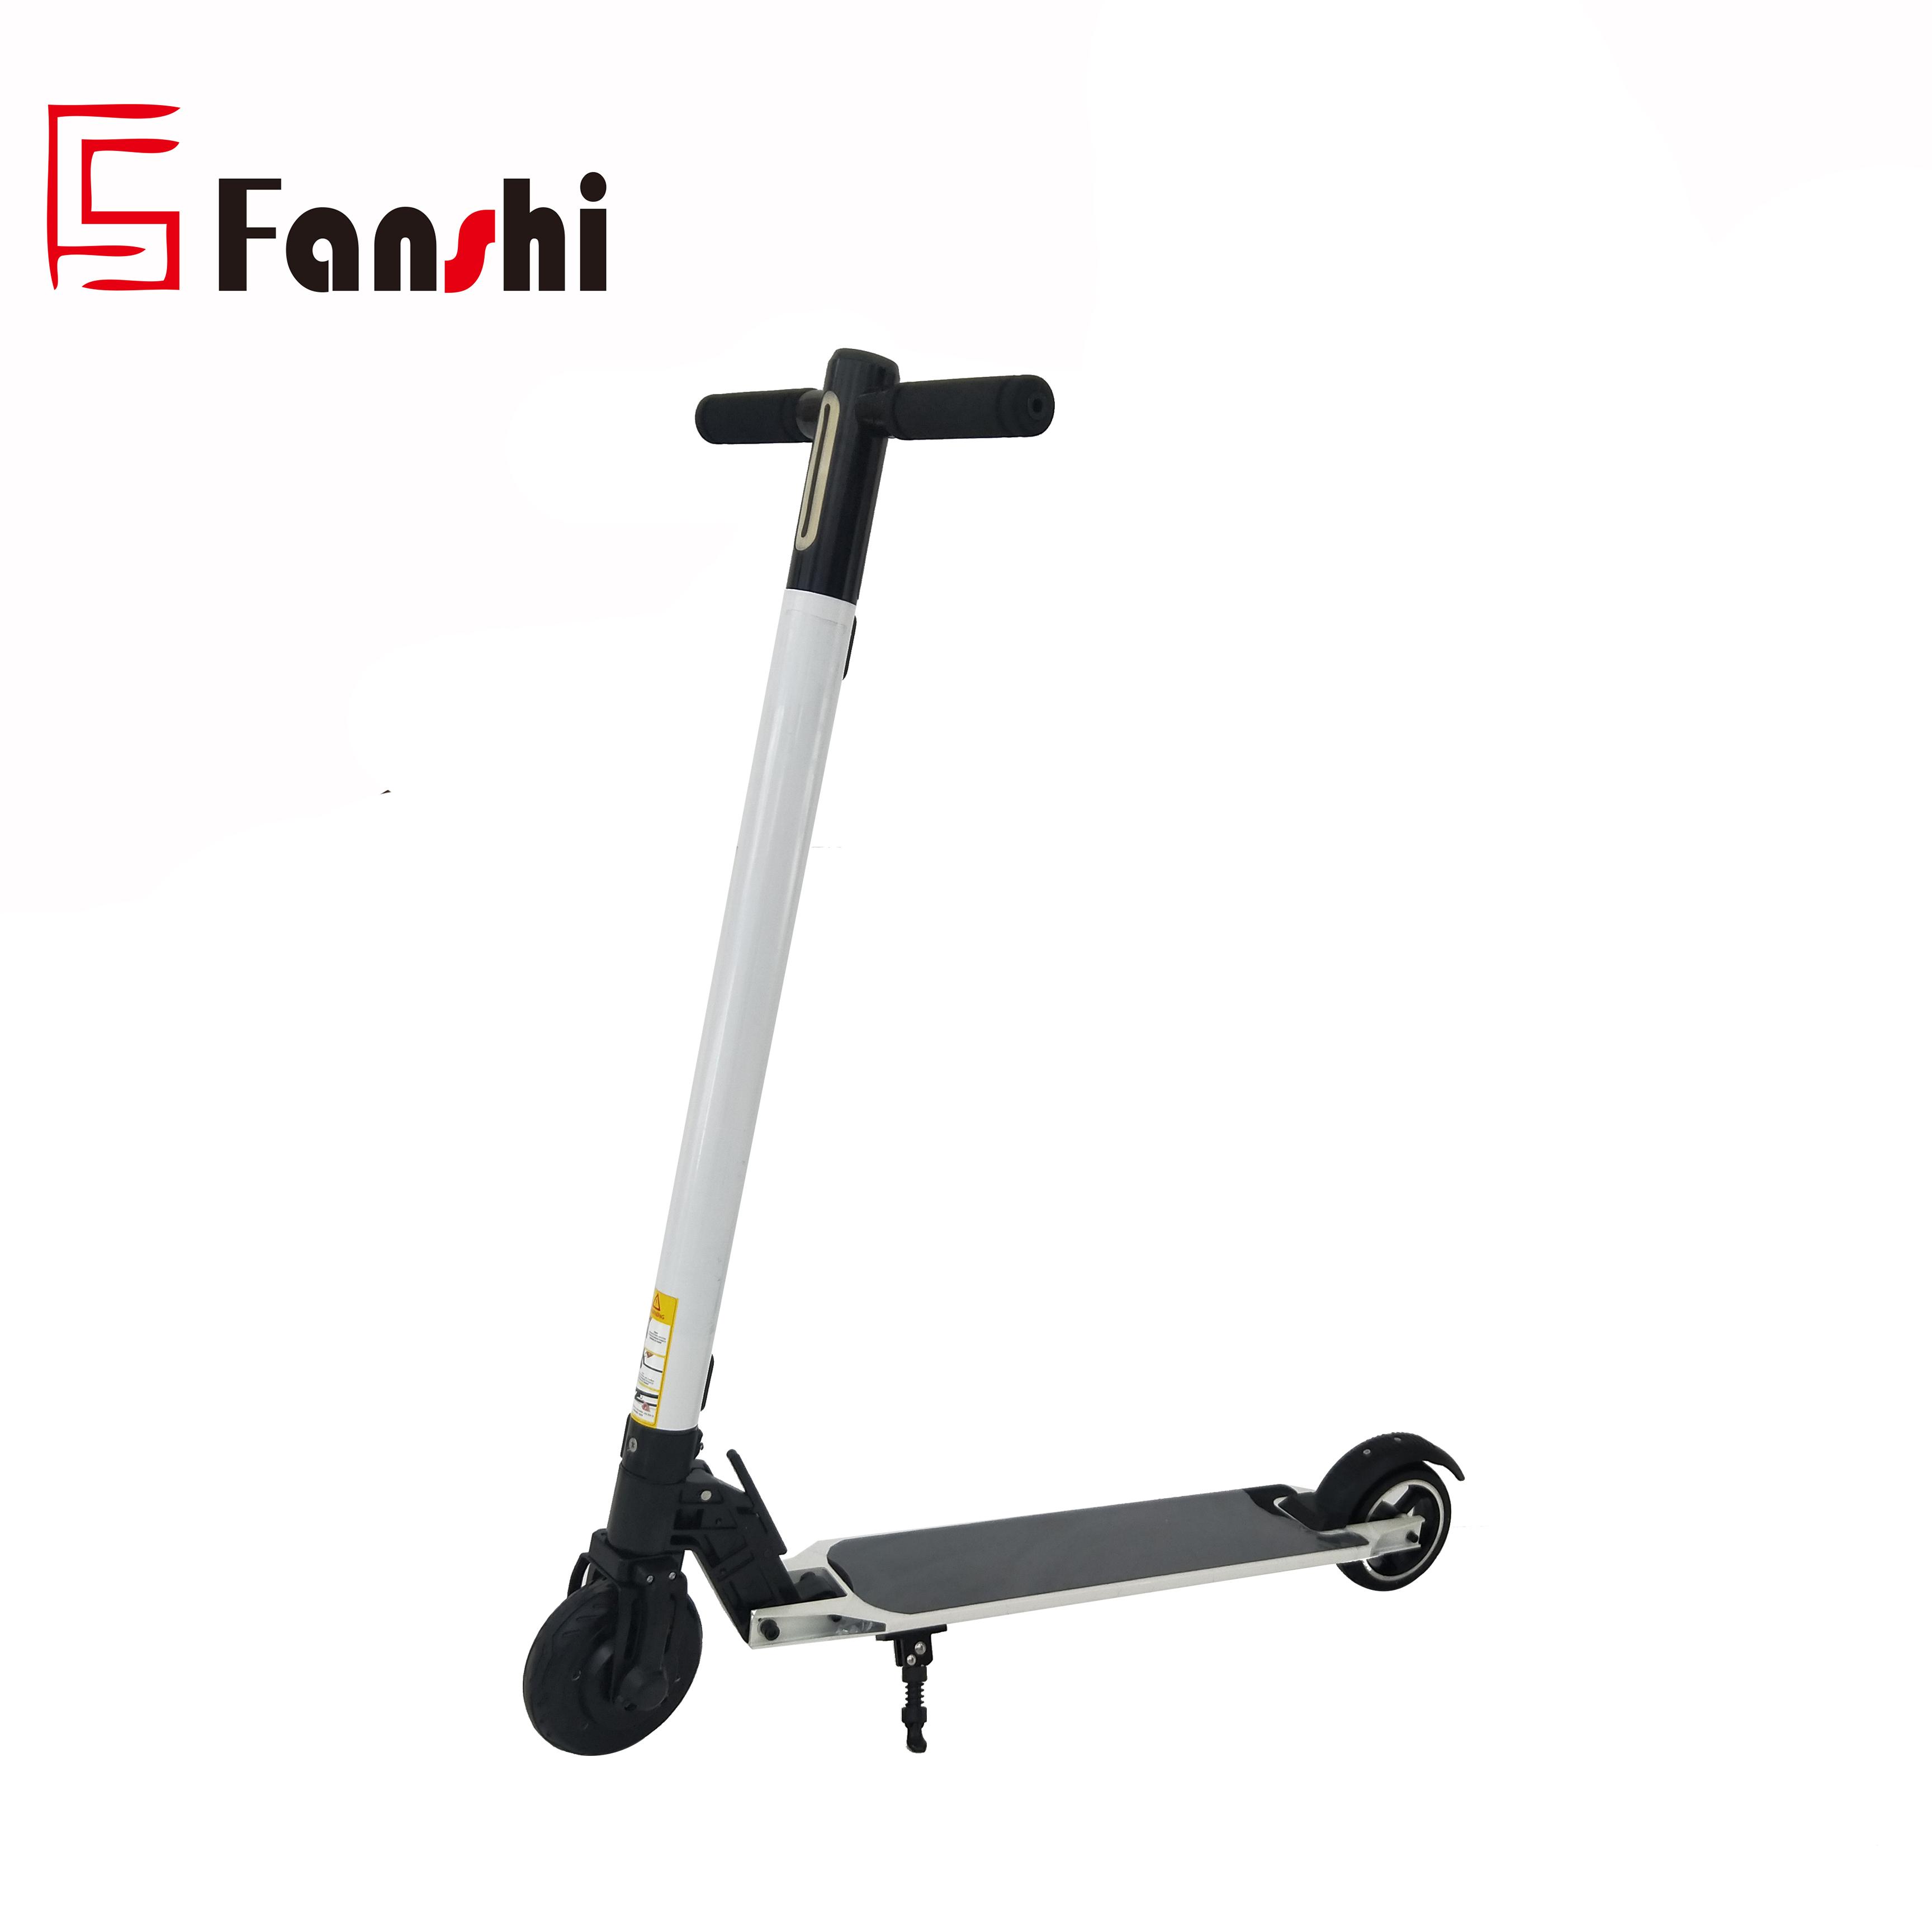 5.5 inch Wheel Cheap Portable Folding Kick Mini Electric scooter Foldable E scooter